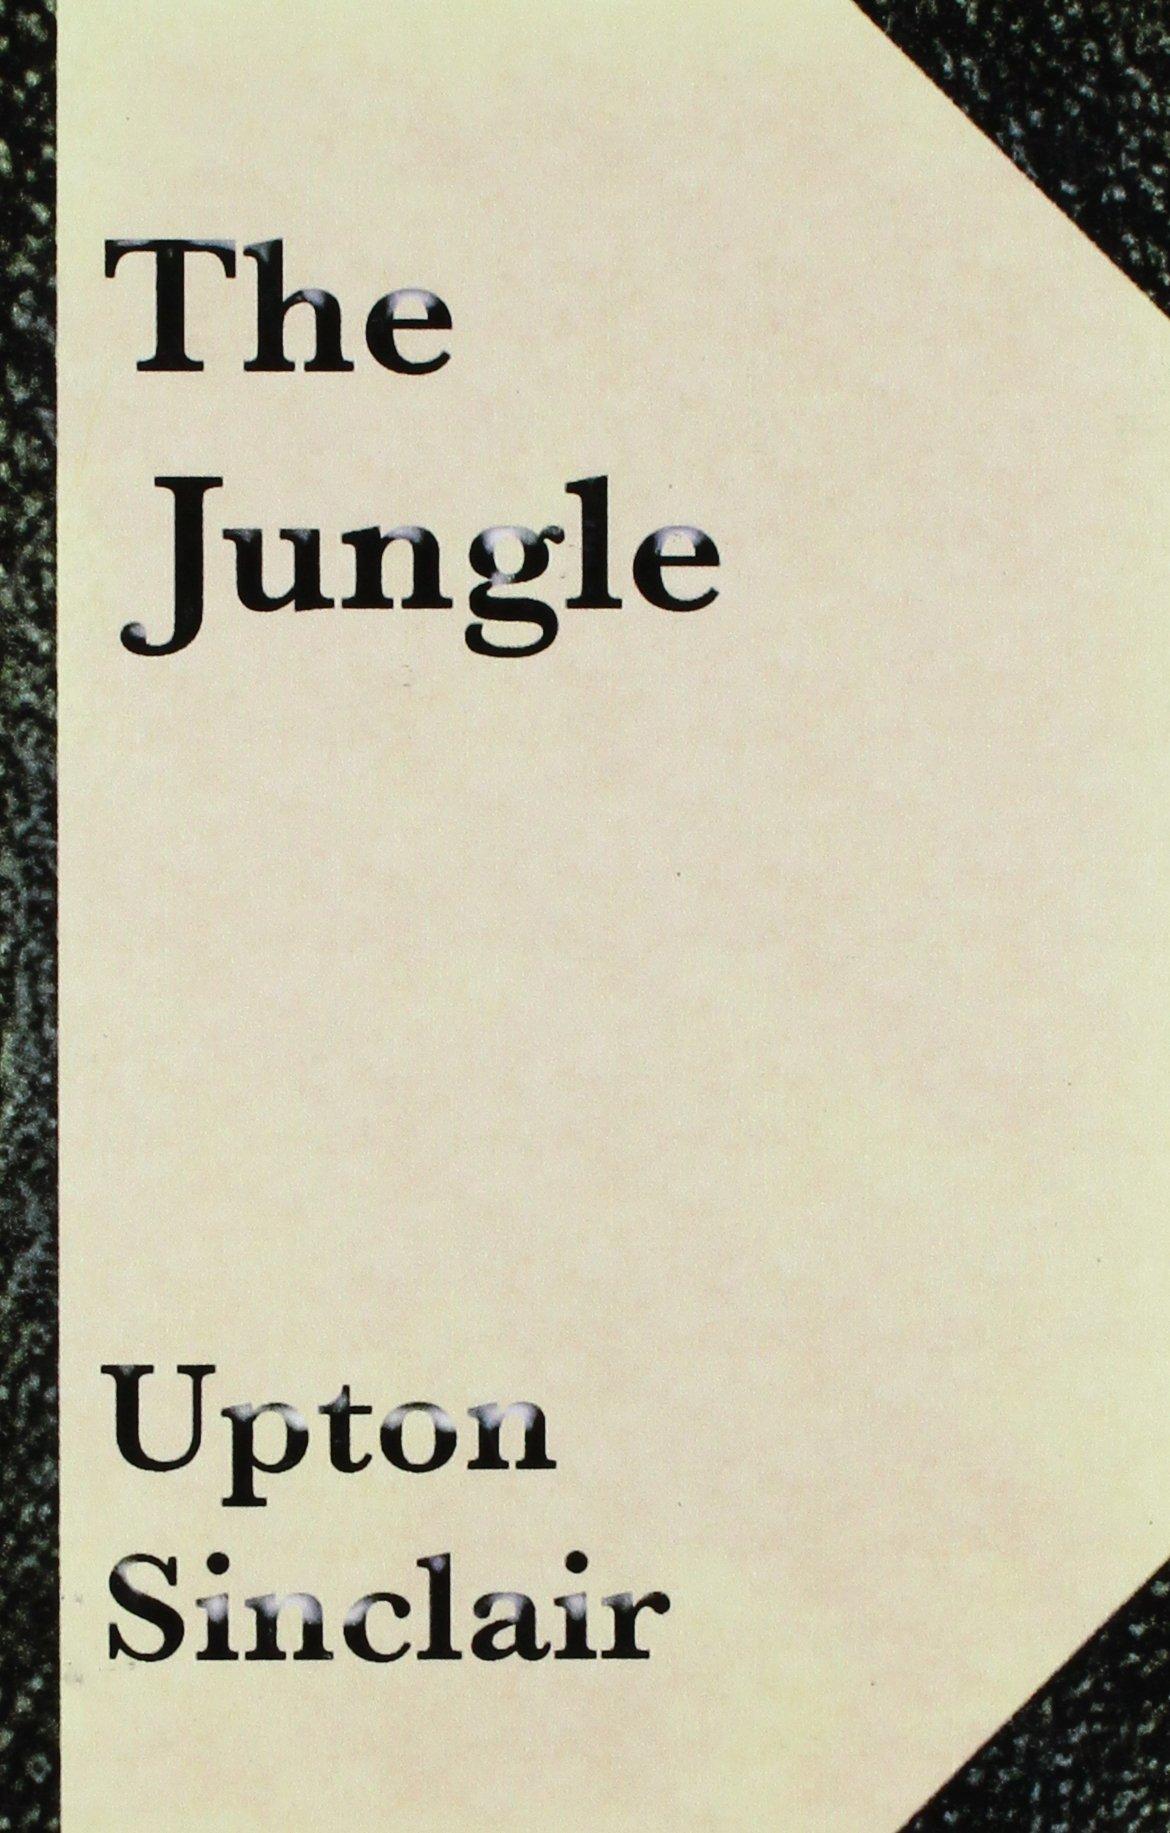 013 Essay Example 813xlafn0gl The Jungle Upton Sinclair Book Rare Review Full